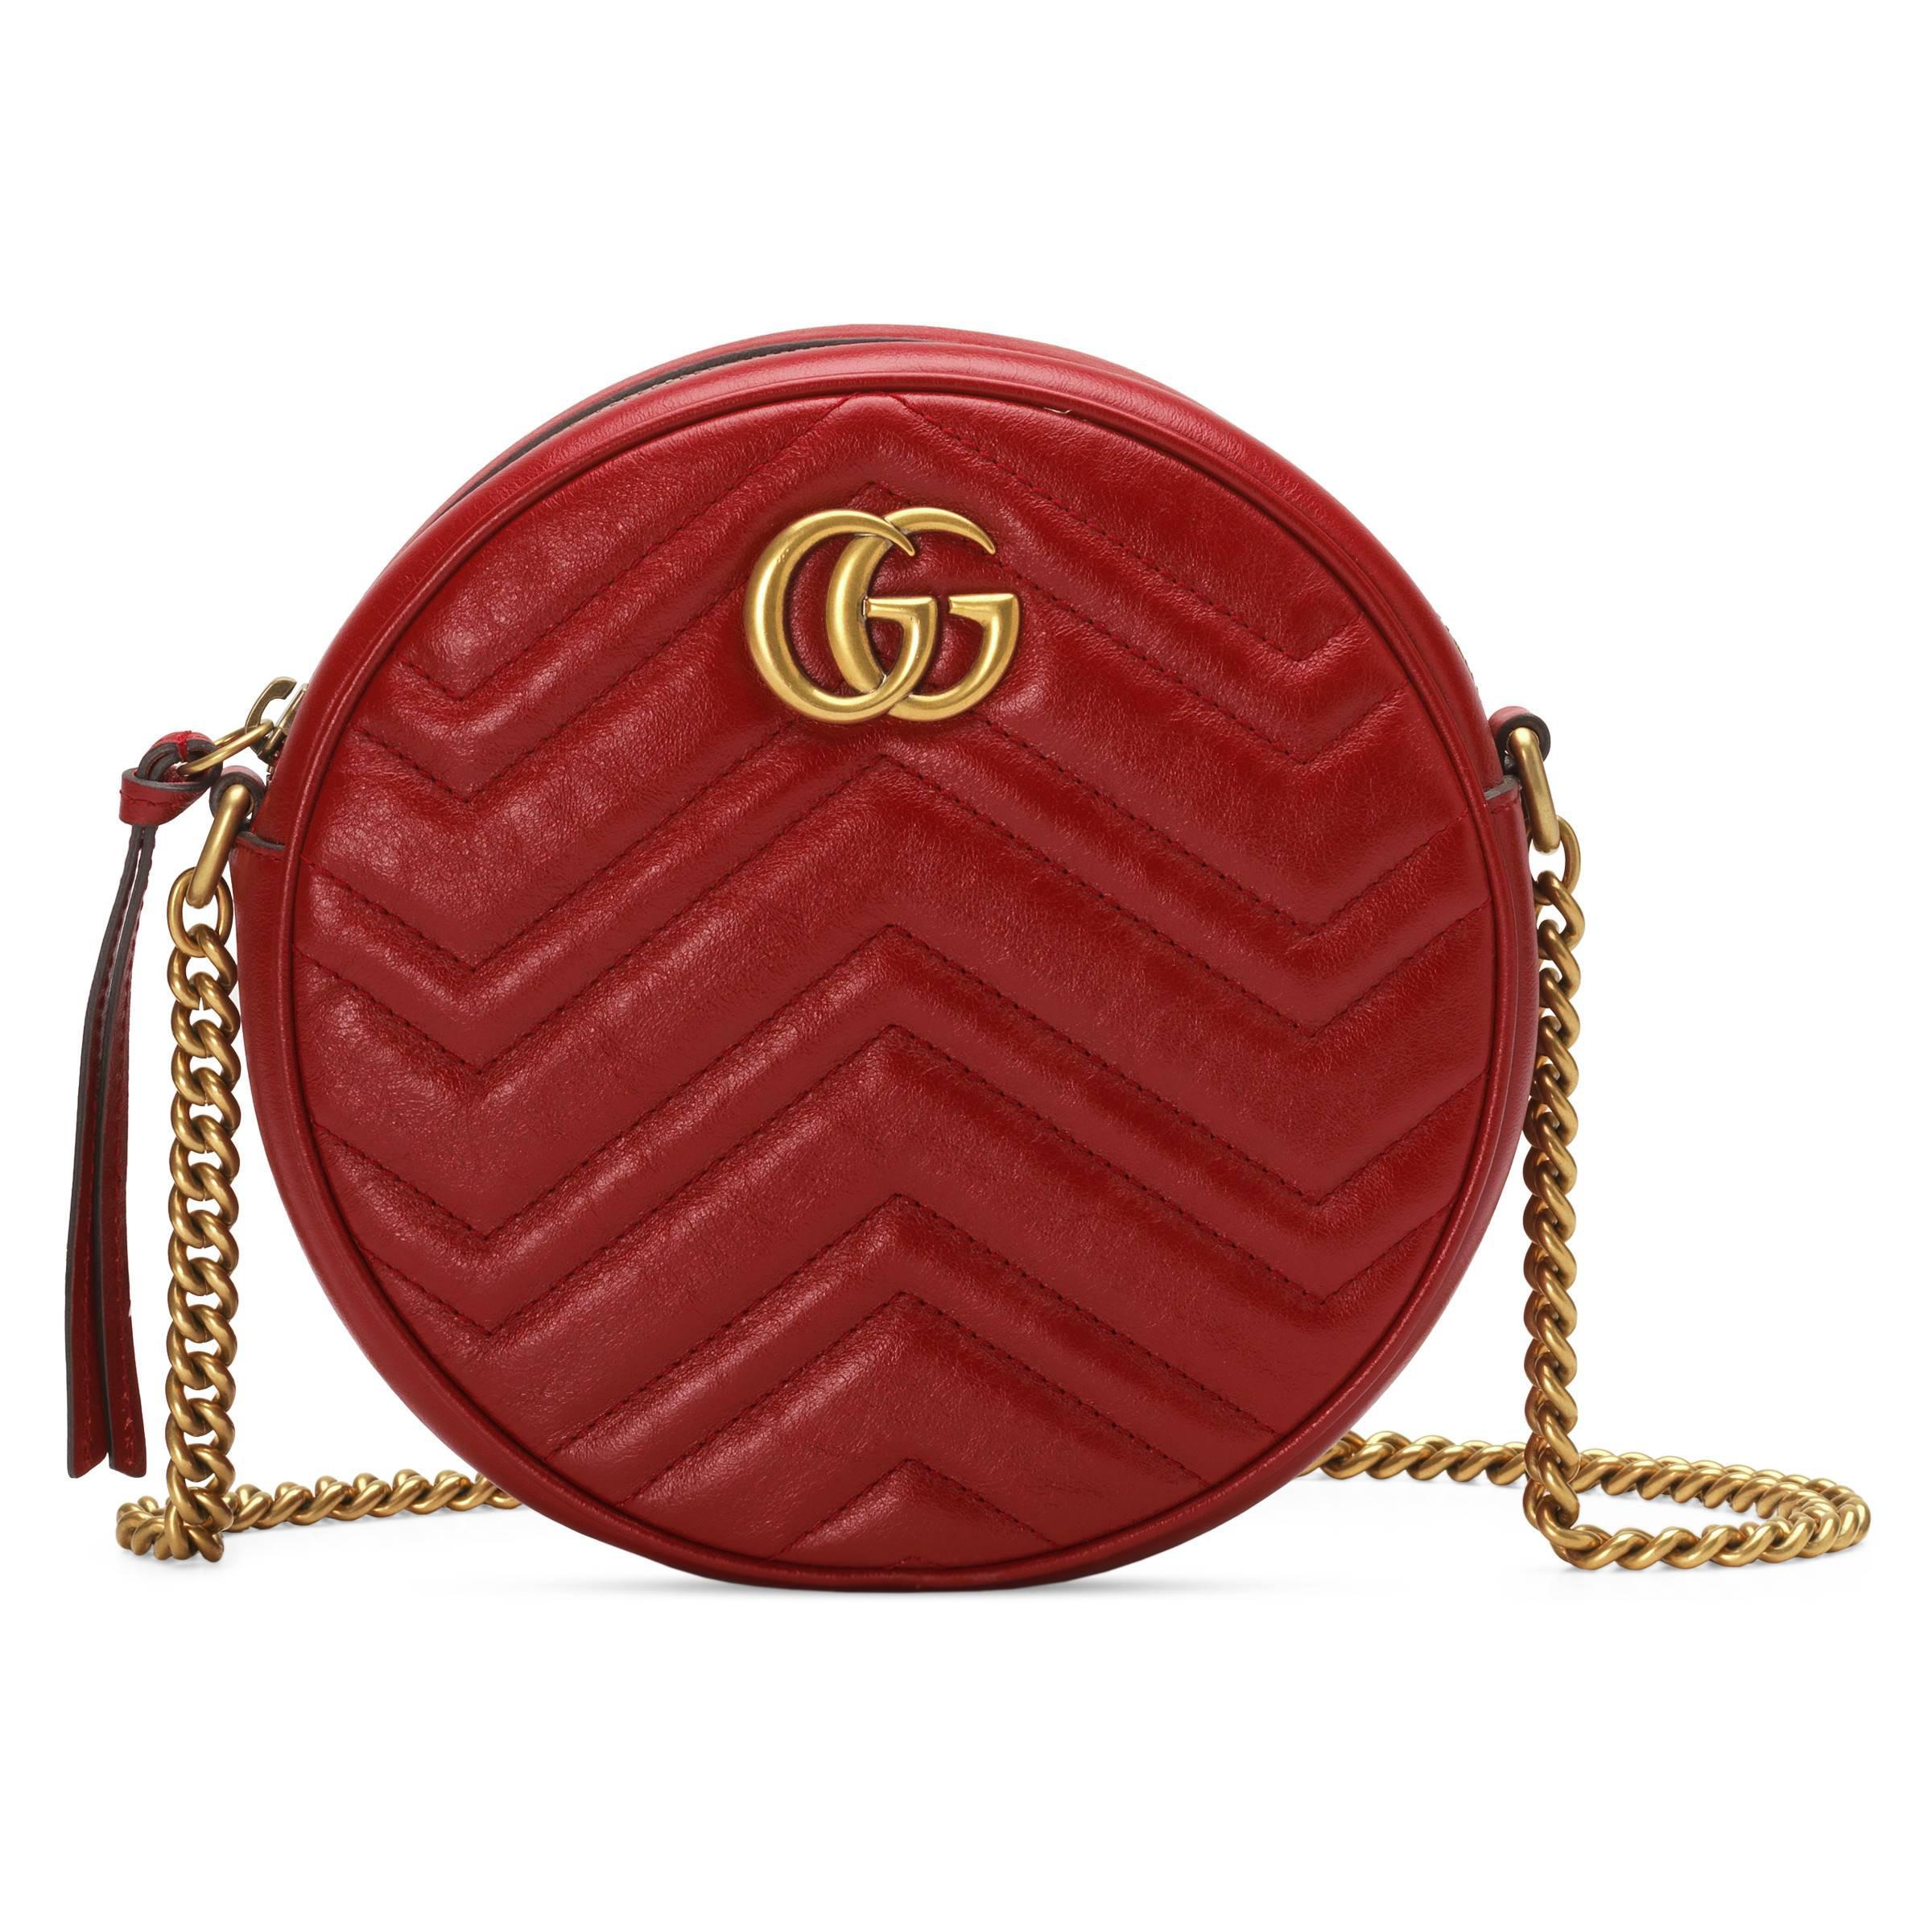 570993e17e1d59 Gucci GG Marmont Mini Round Shoulder Bag in Red - Lyst